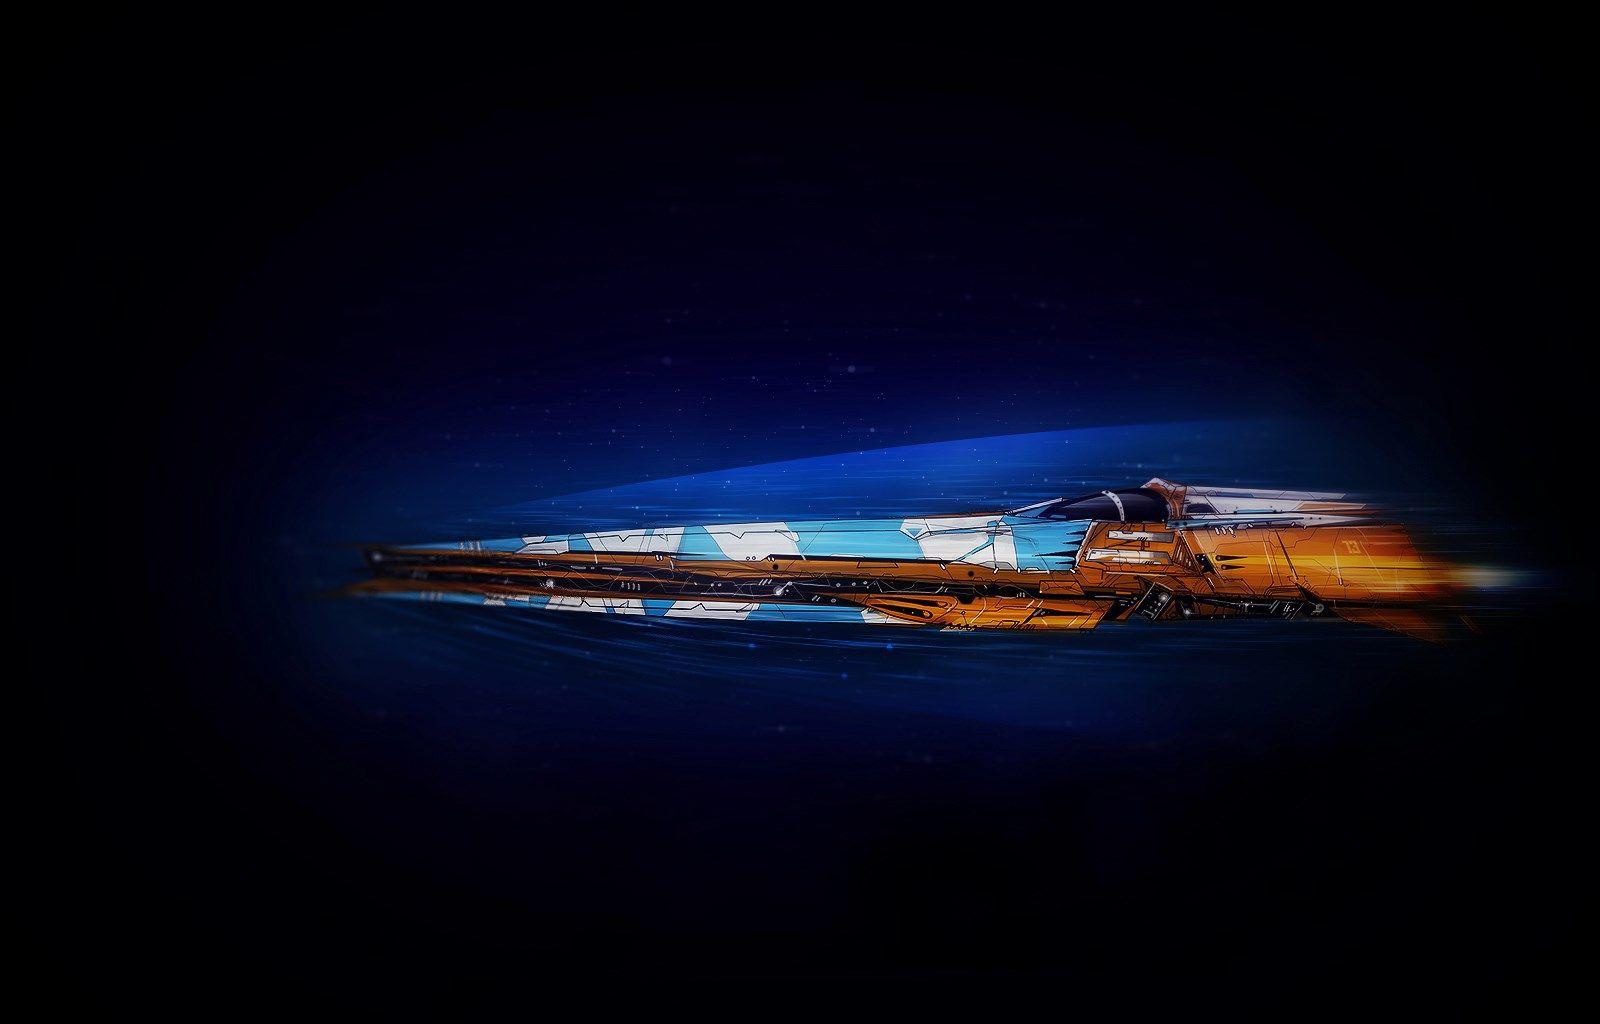 spaceship picture - Full HD Backgrounds, 1600x1024 (100 kB) | ololoshenka | Hd wallpaper ...